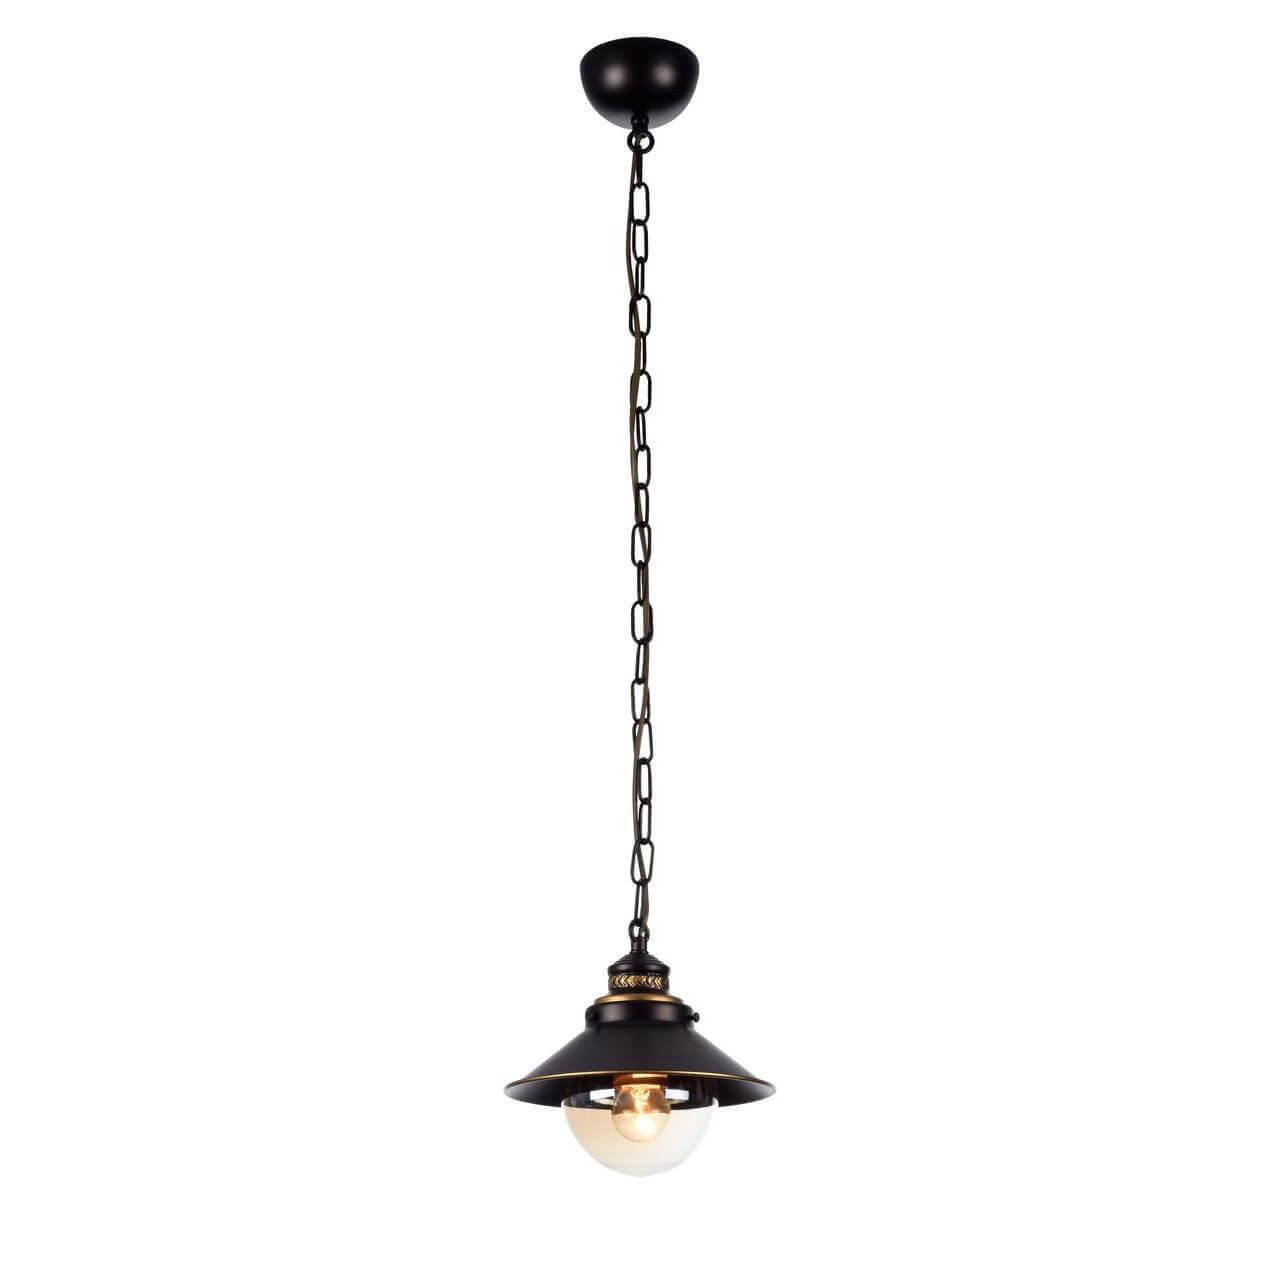 Светильник Arte Lamp A4577SP-1CK Grazioso бра arte lamp bene a9179ap 1ck